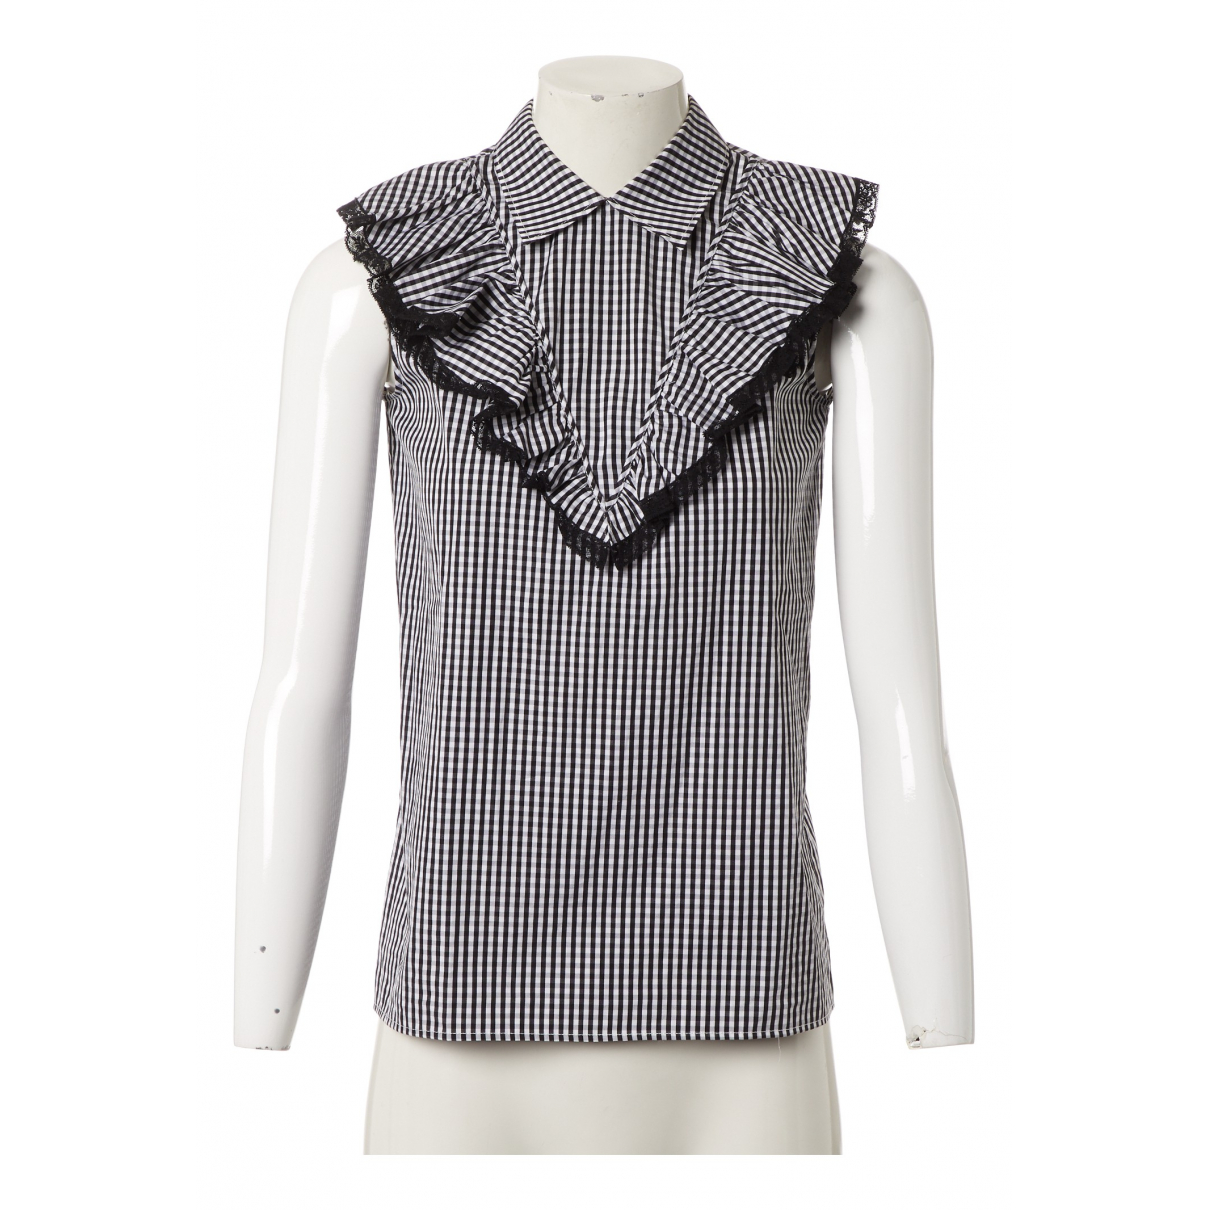 Miu Miu N Black Cotton  top for Women 36 IT